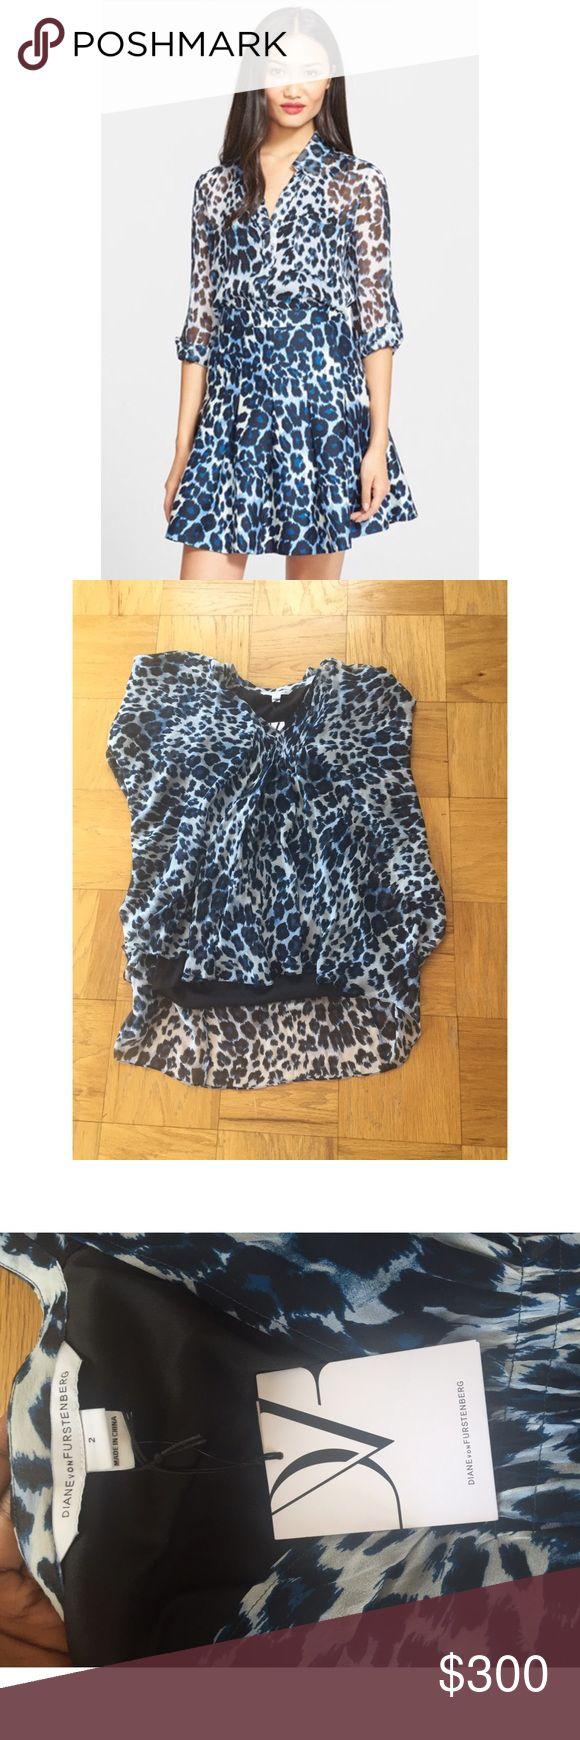 Diane Von Furstenberg Cheetah Print Blouse This shirt is 100% Silk Lining, 97% Polyester, 3% Spandex. Not the same style shirt. Diane von Furstenberg Tops Blouses